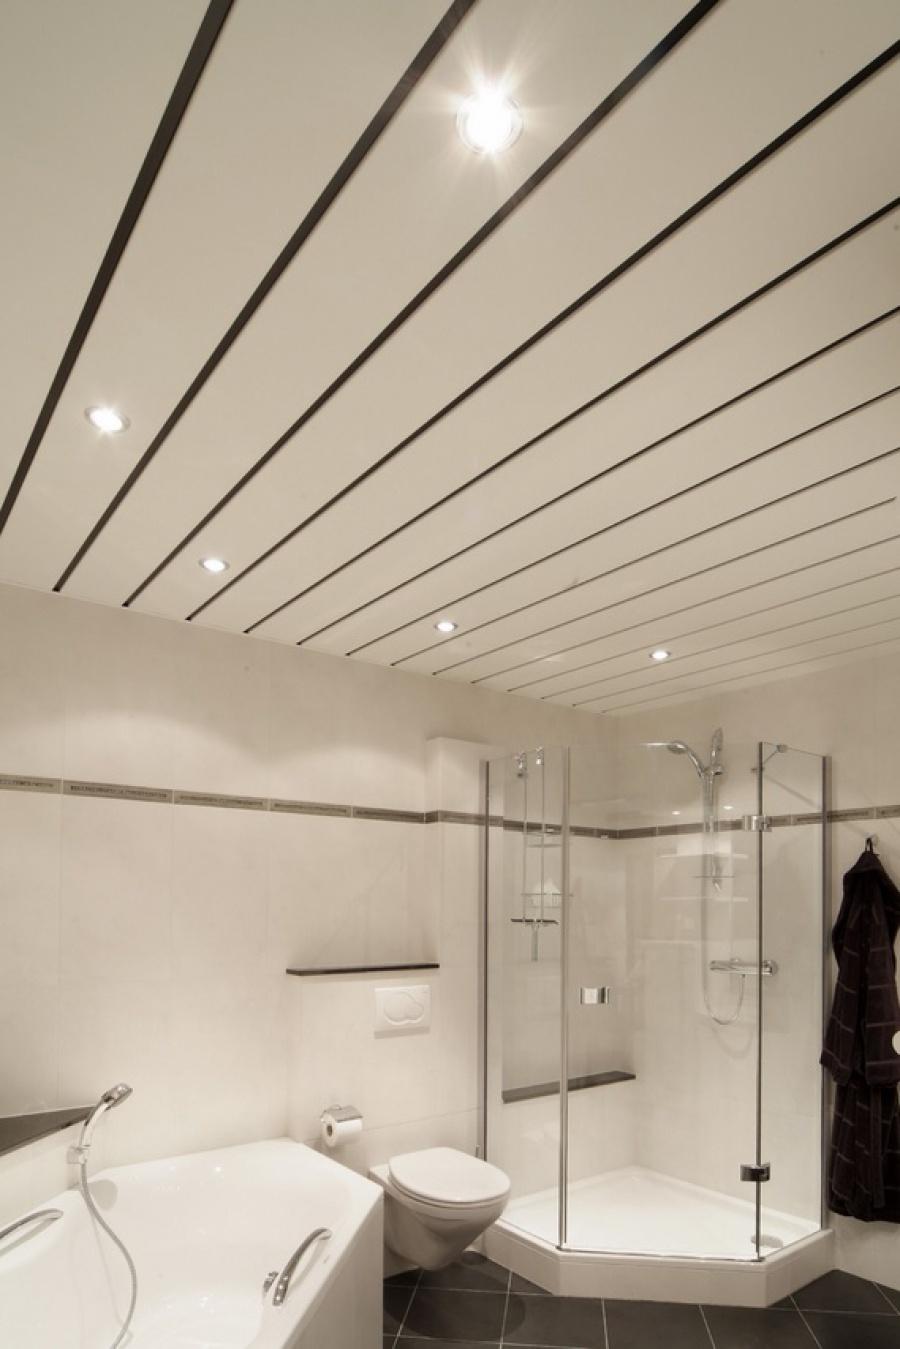 badkamerplafond hoefnagel tegels keukens en sanitair. Black Bedroom Furniture Sets. Home Design Ideas